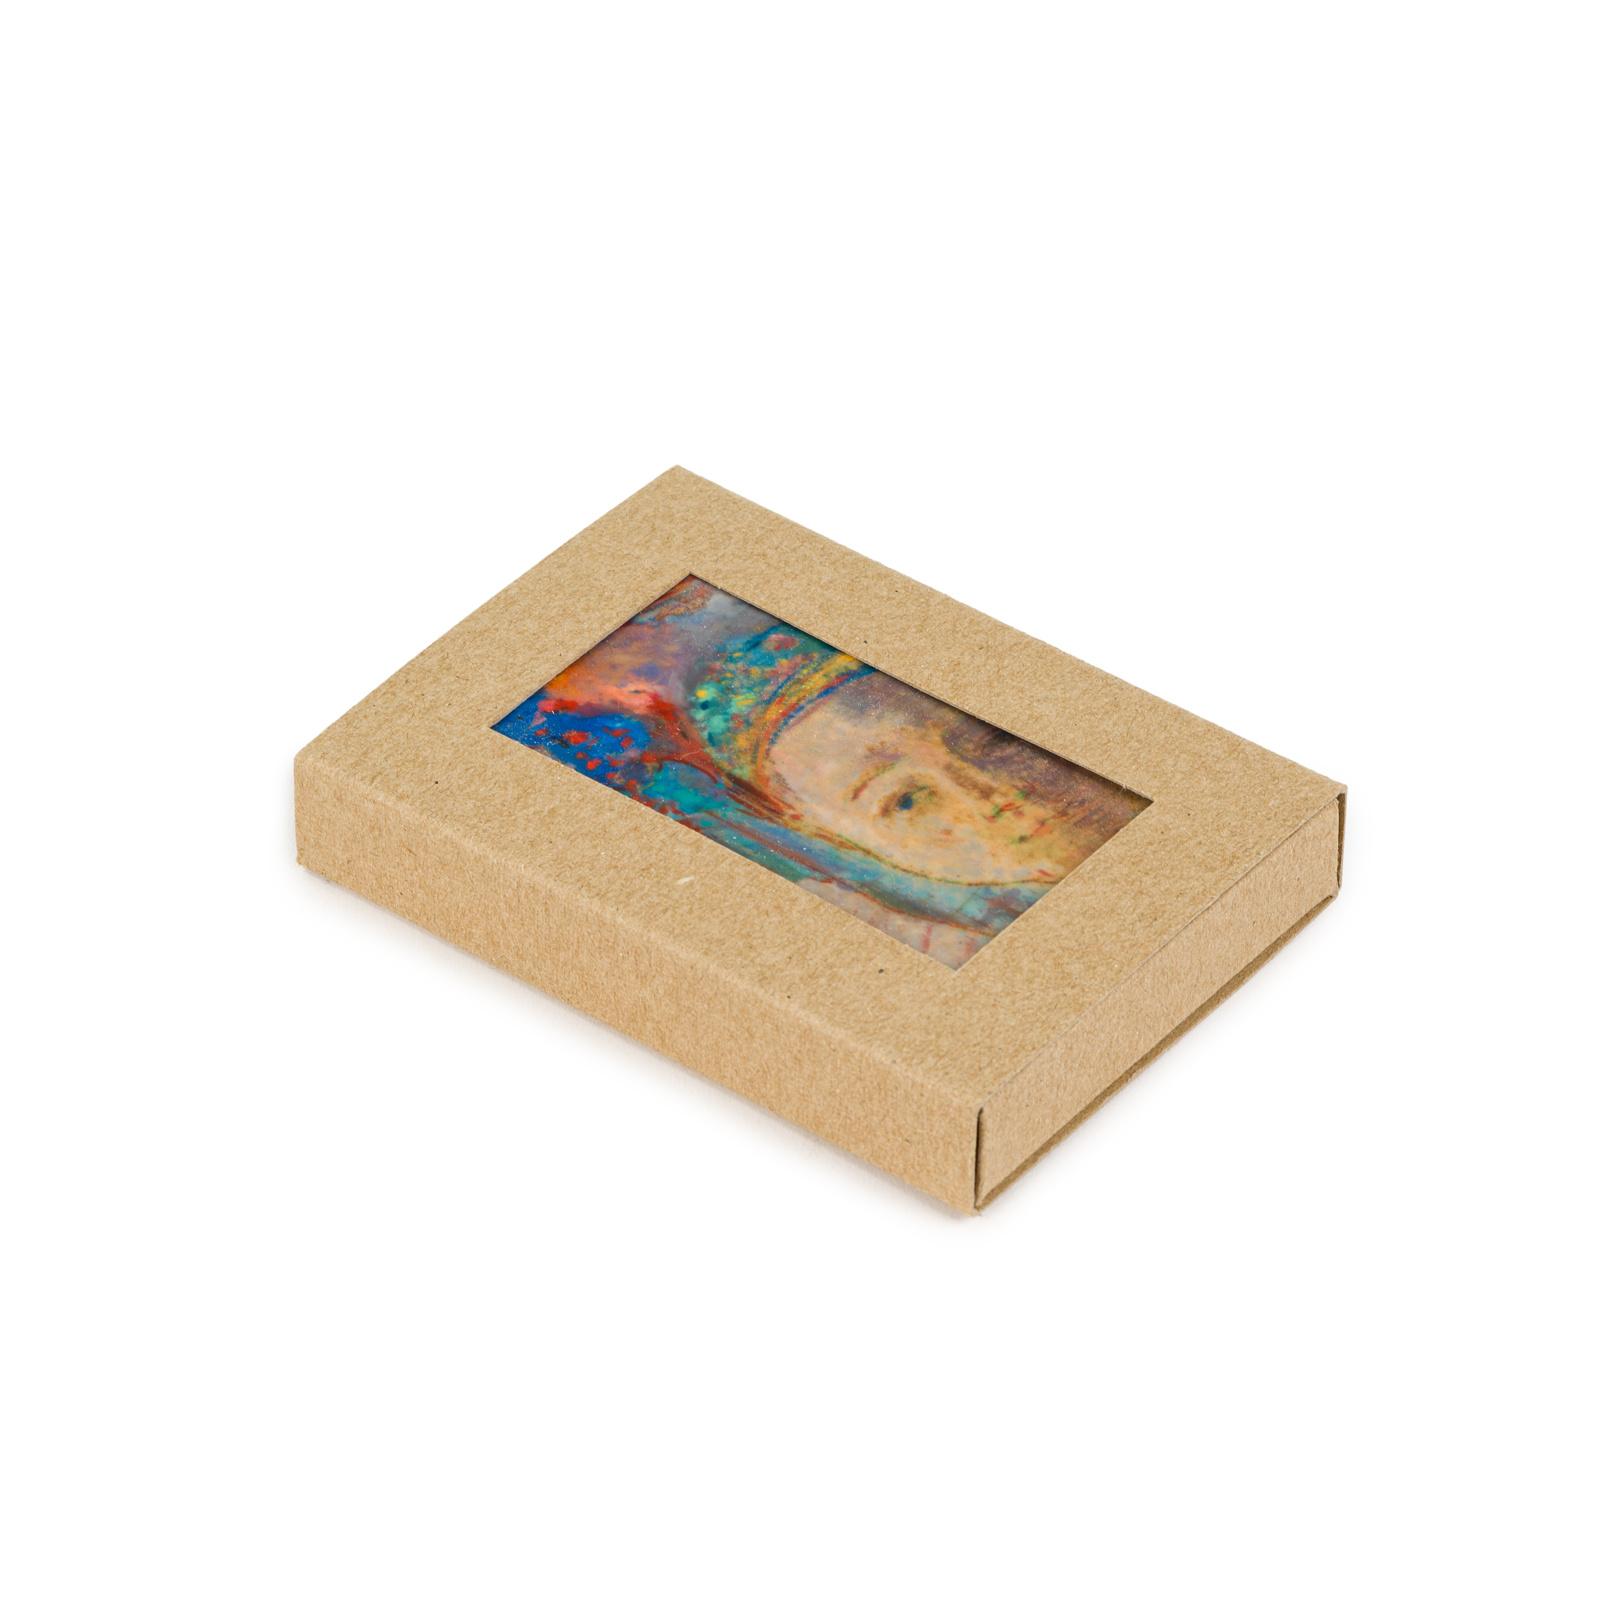 Koelkast magneet Odilon Redon - De palm